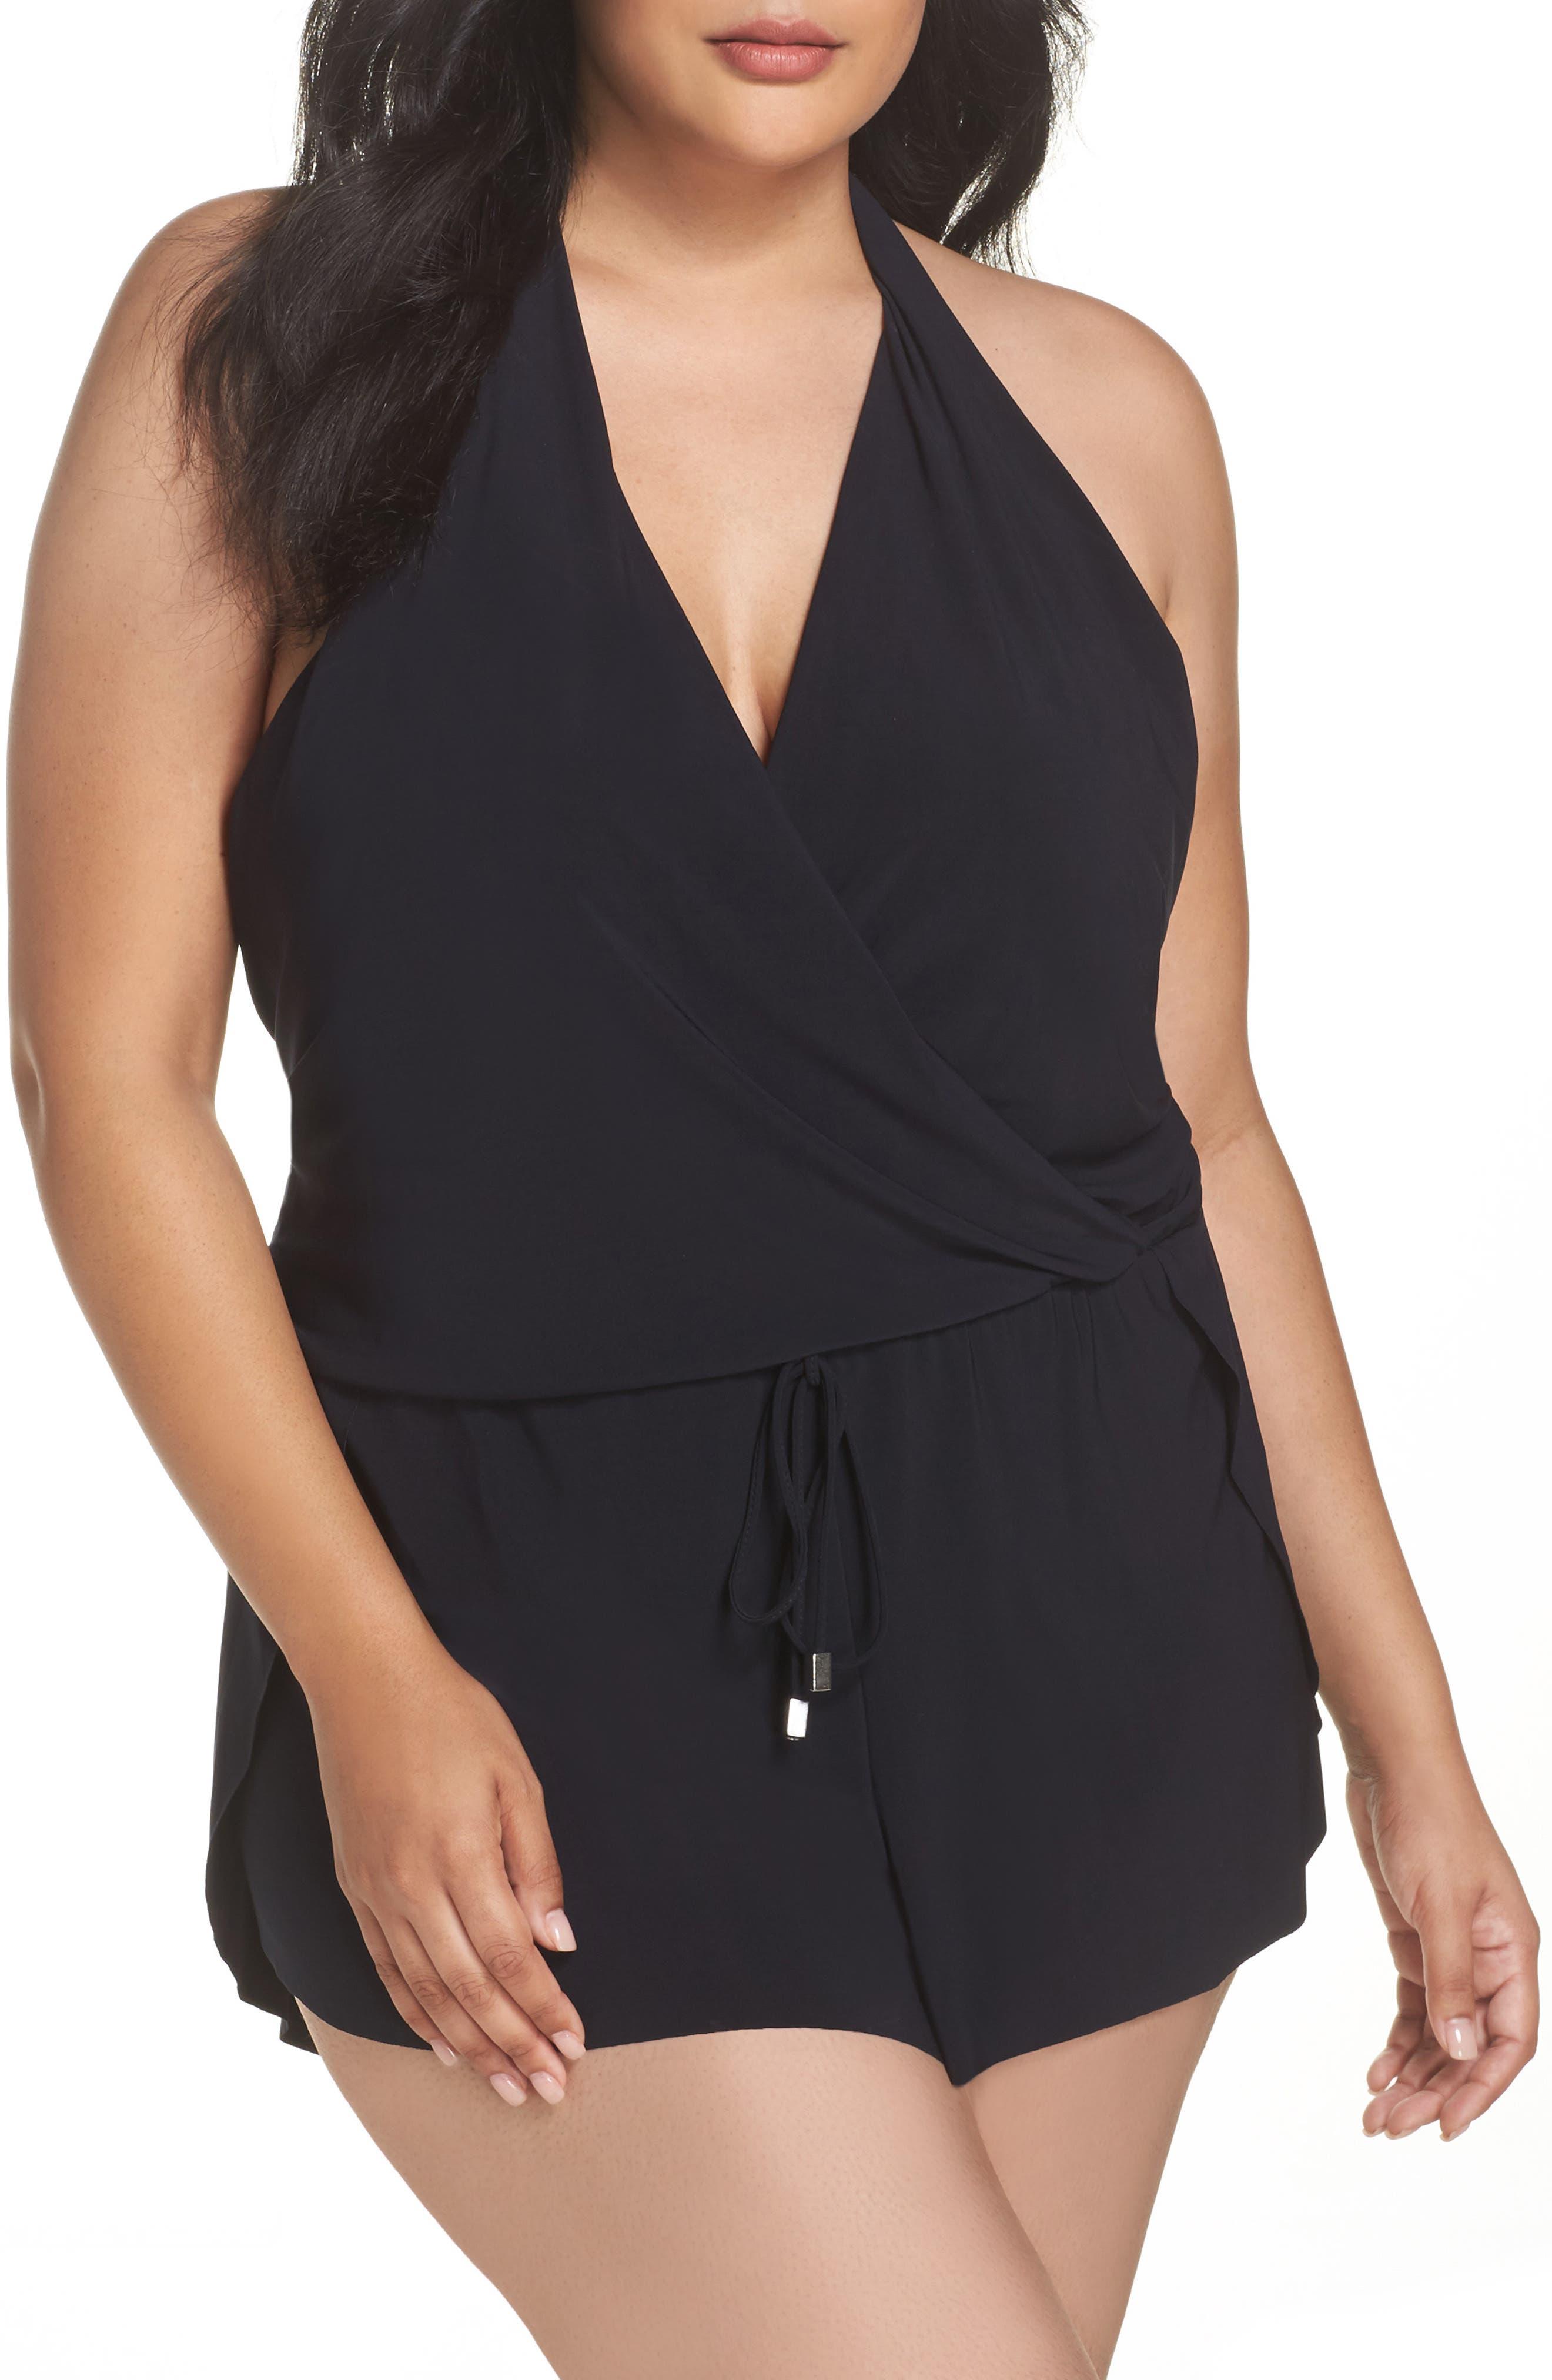 Bianca One-Piece Romper Swimsuit,                         Main,                         color, Black